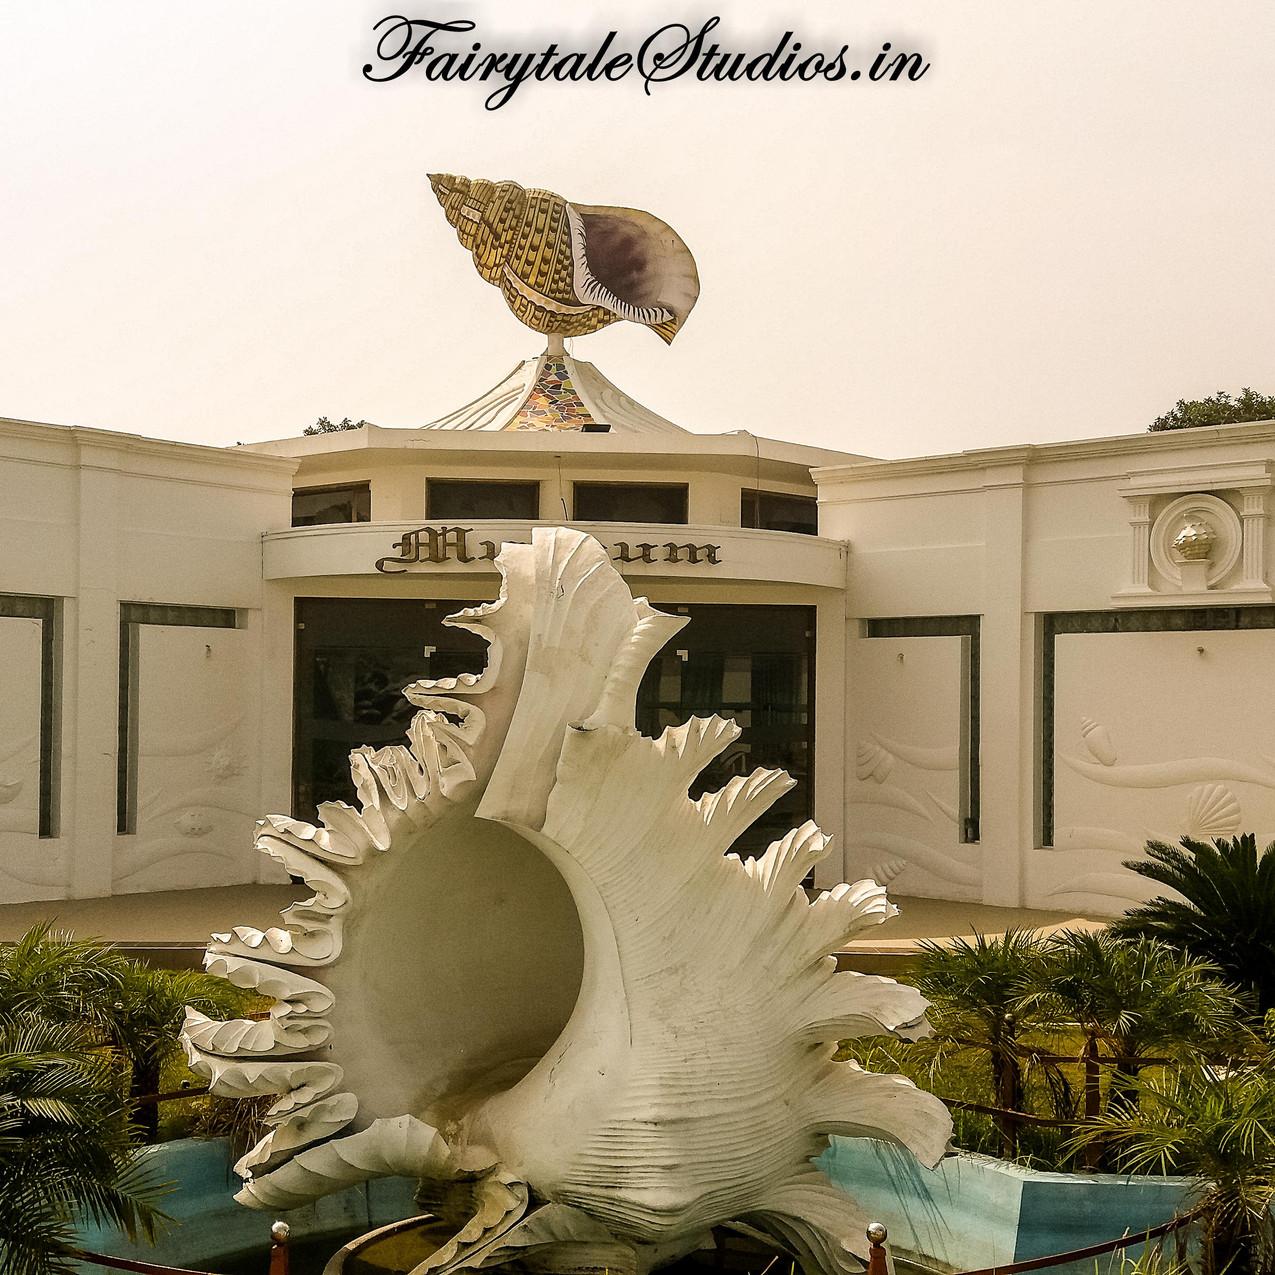 Seashell Museum_Mahabalipuram_Fairytale Travel Blog (42)